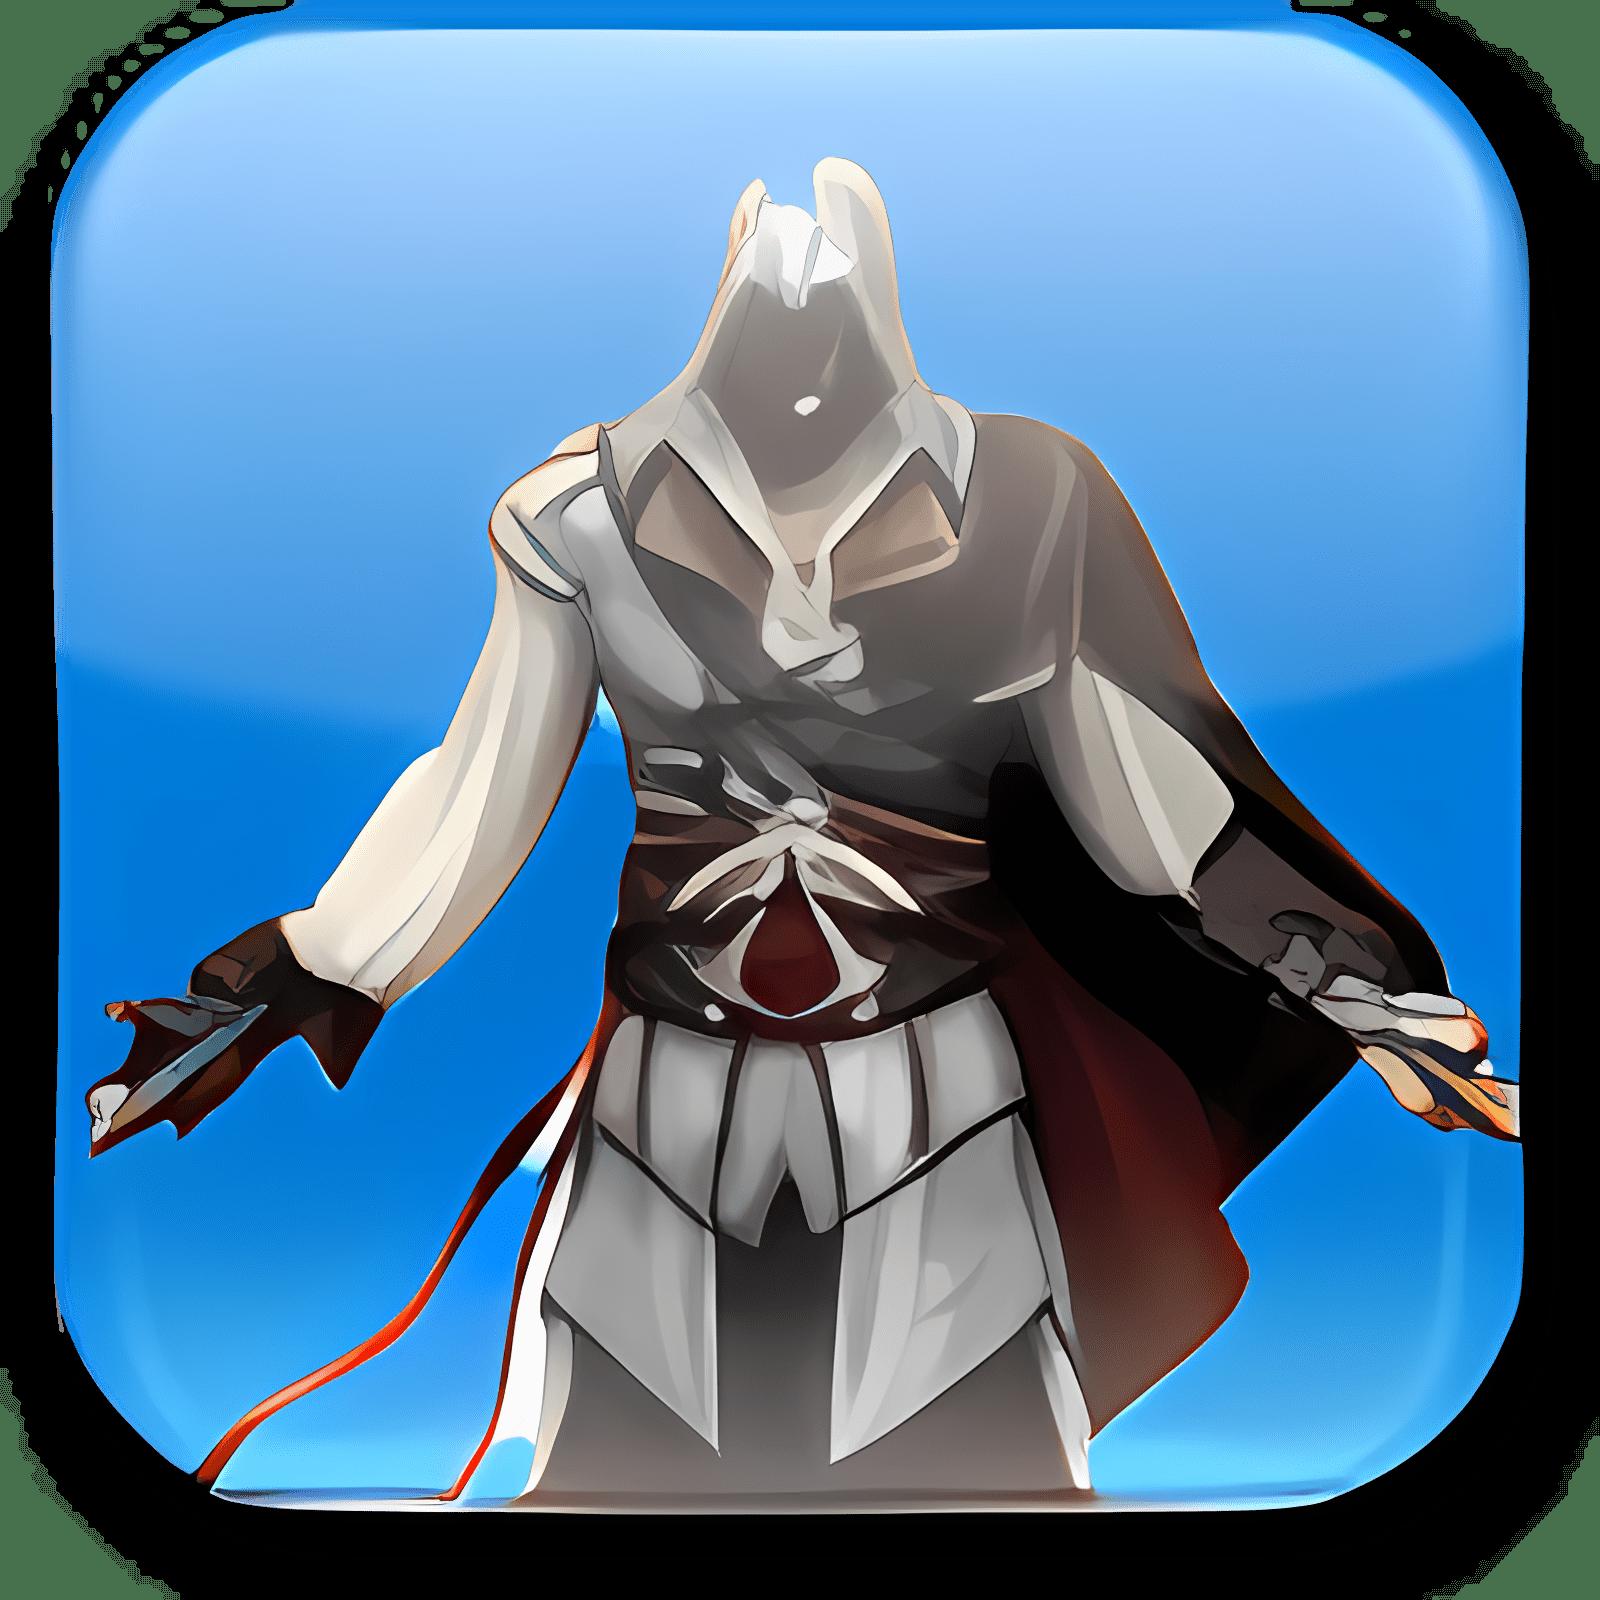 Assassin's Creed II Official Wallpaper